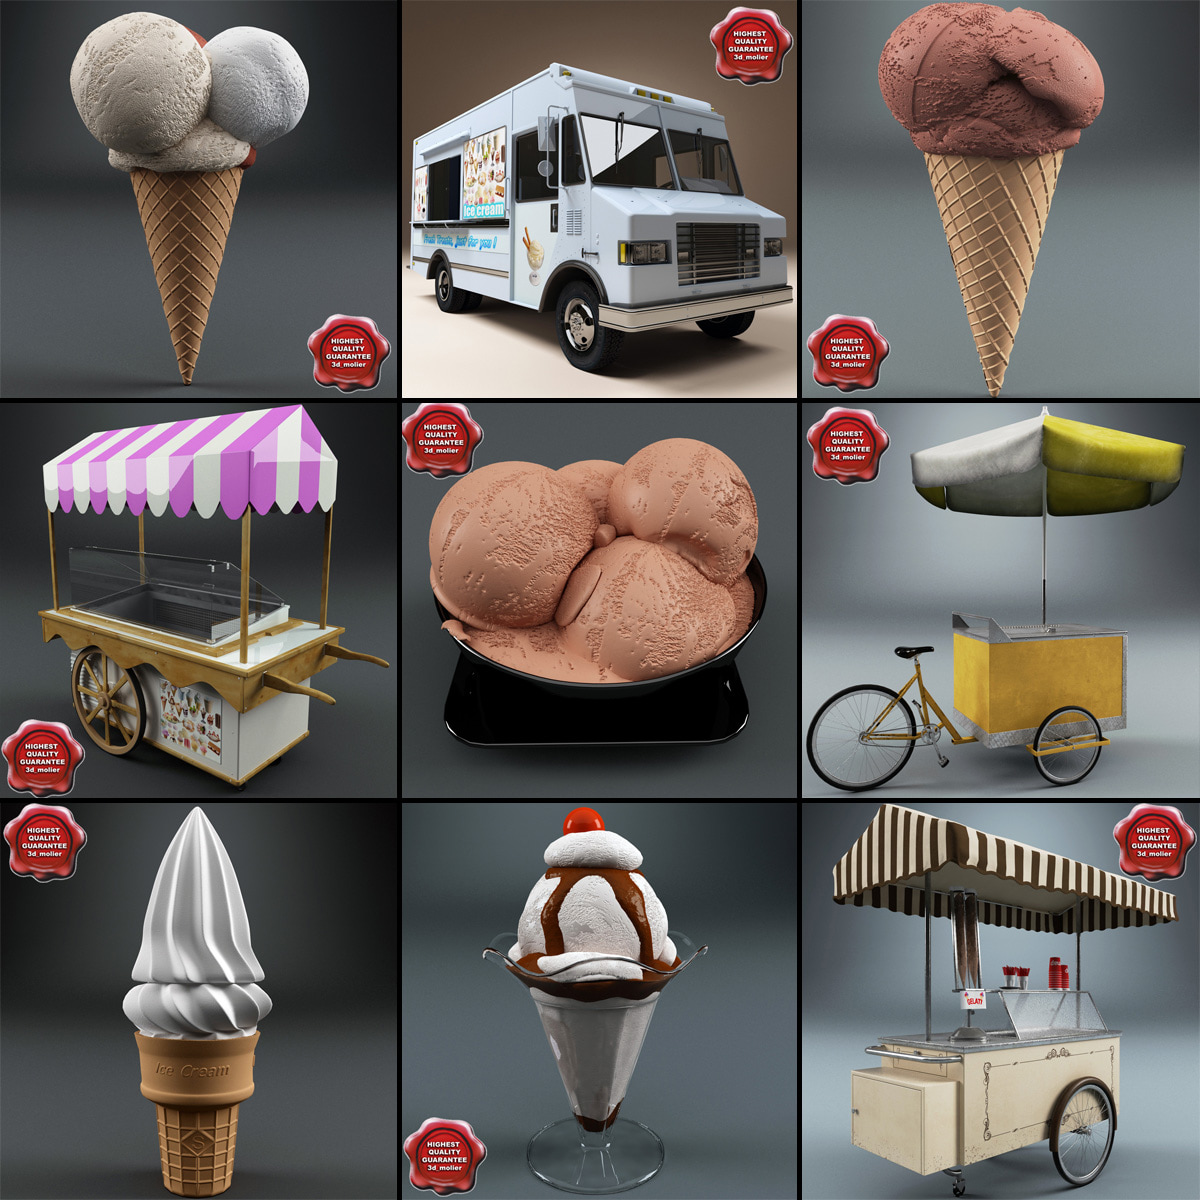 Ice_Cream_Collection_V4_000.jpg